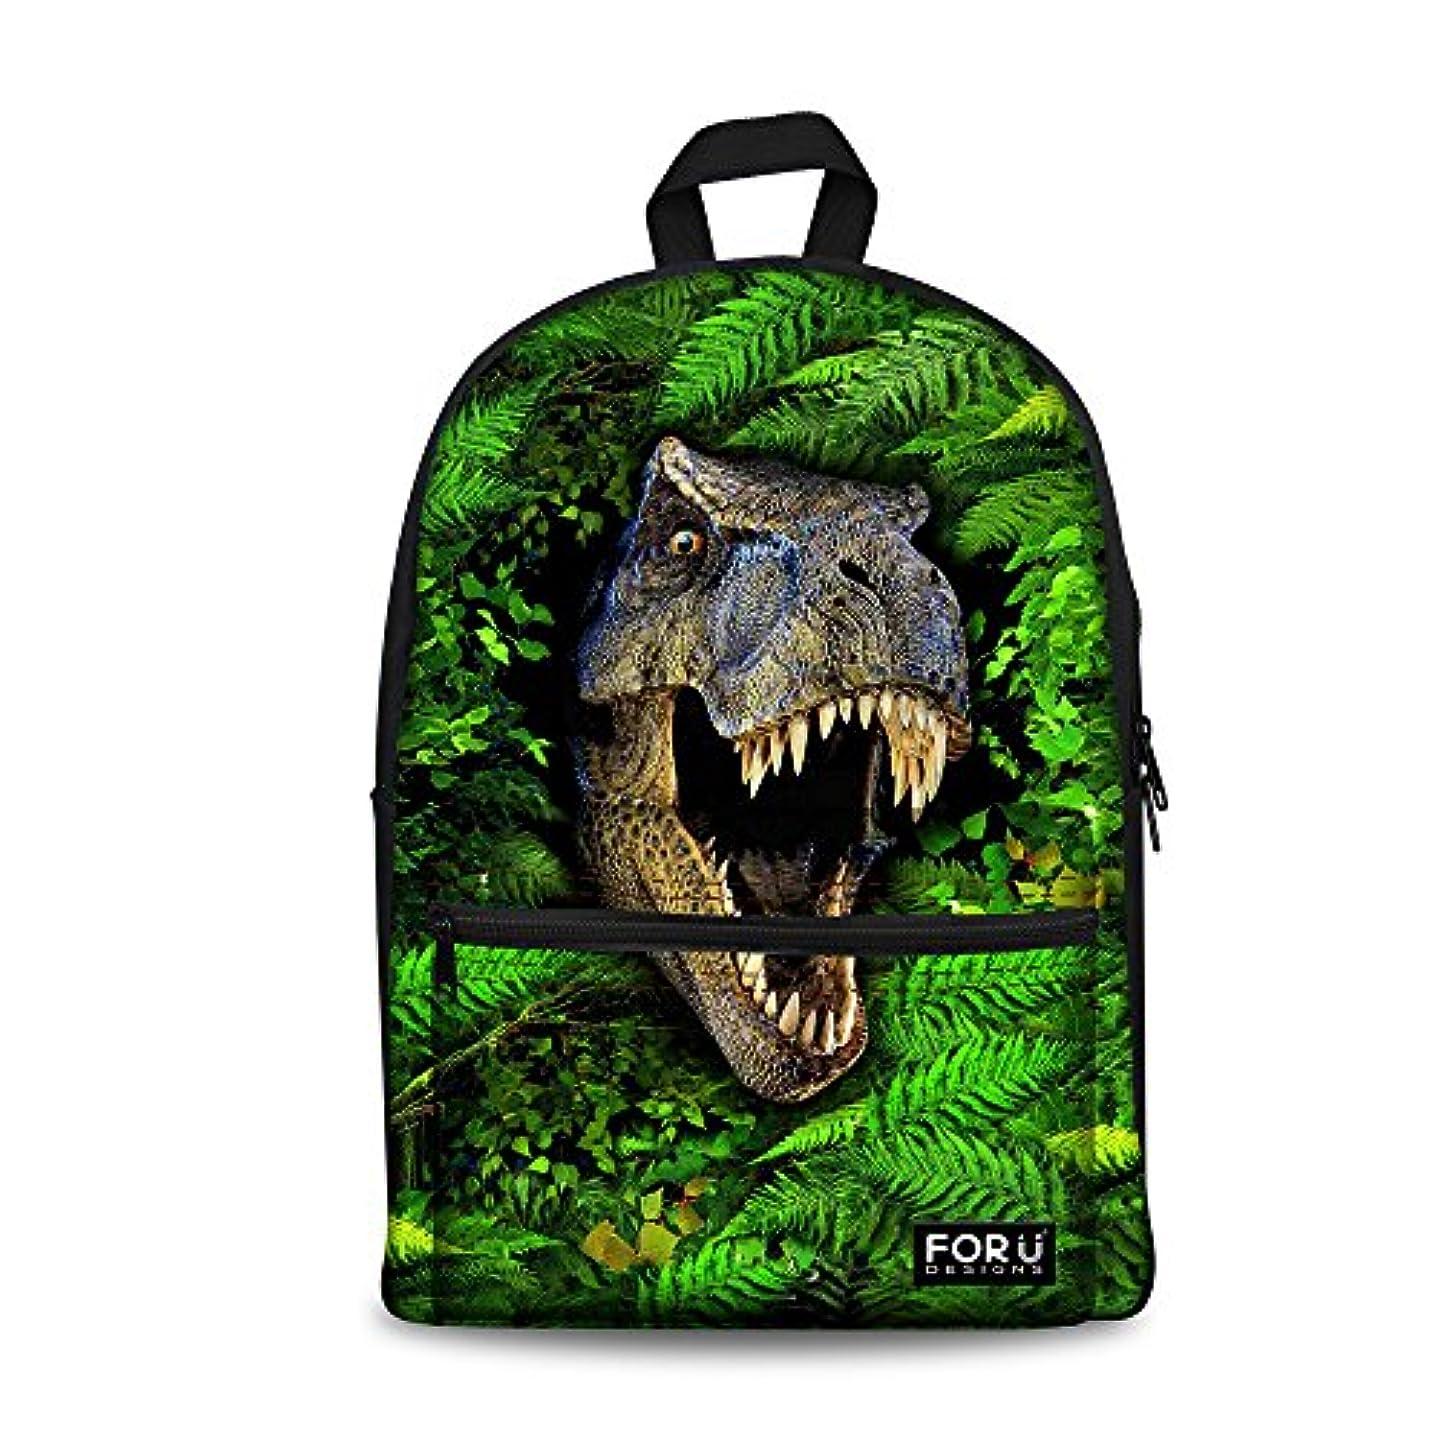 Bigcardesign Green Dinosaur Canvas Backpack School Bag for Teenager Boys Book Bag